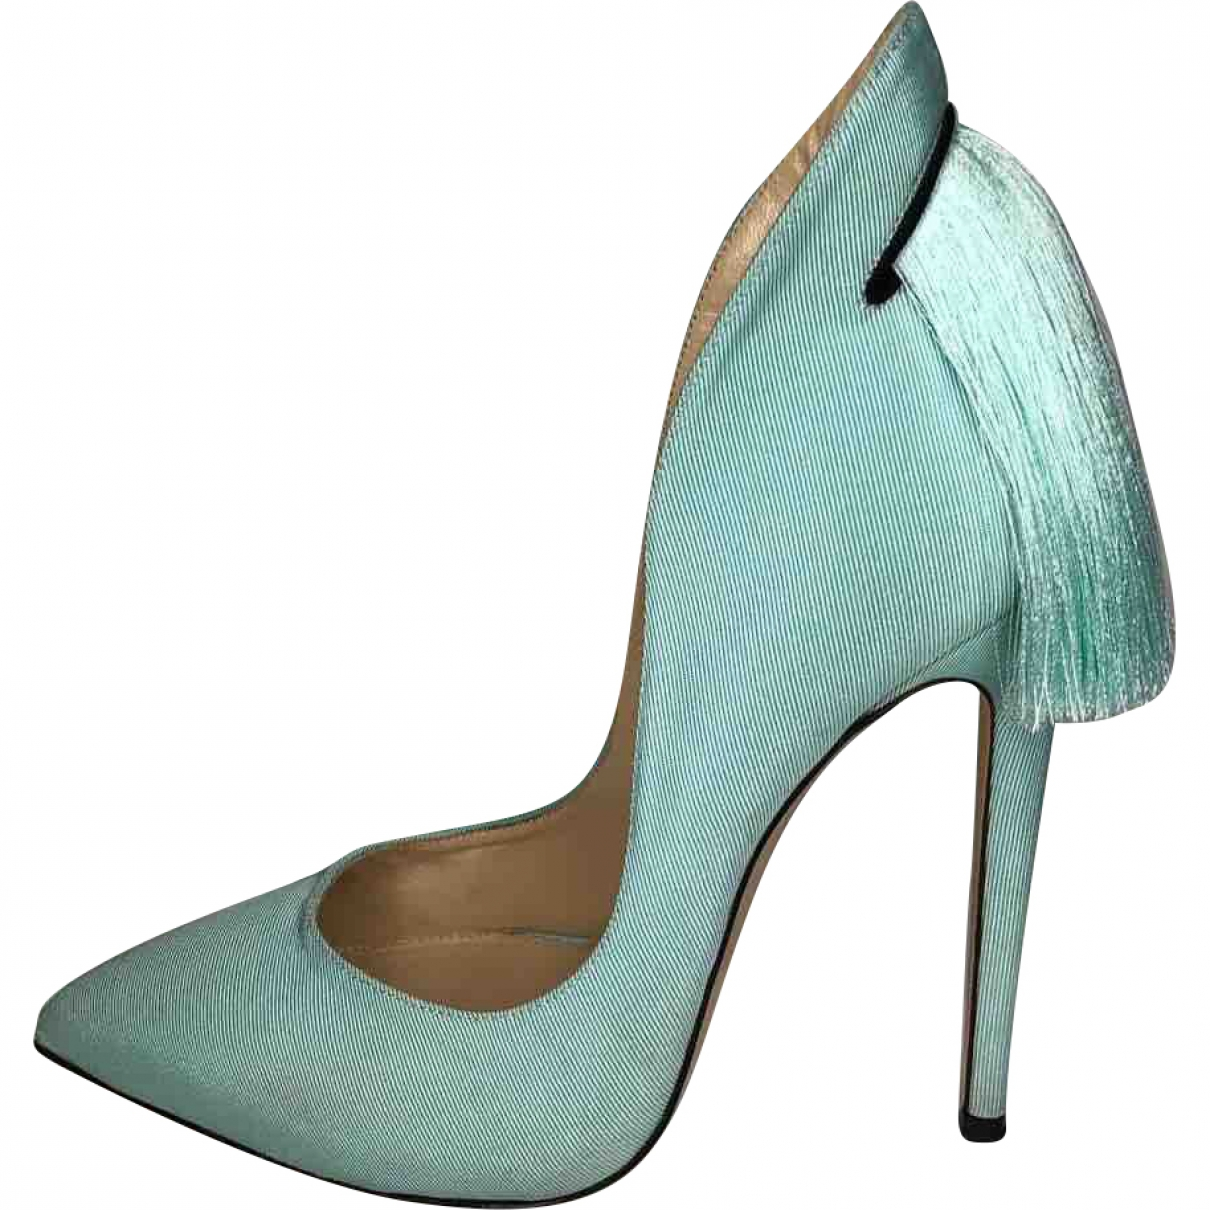 Aleksander Siradekian \N \N Cloth Heels for Women 38 EU